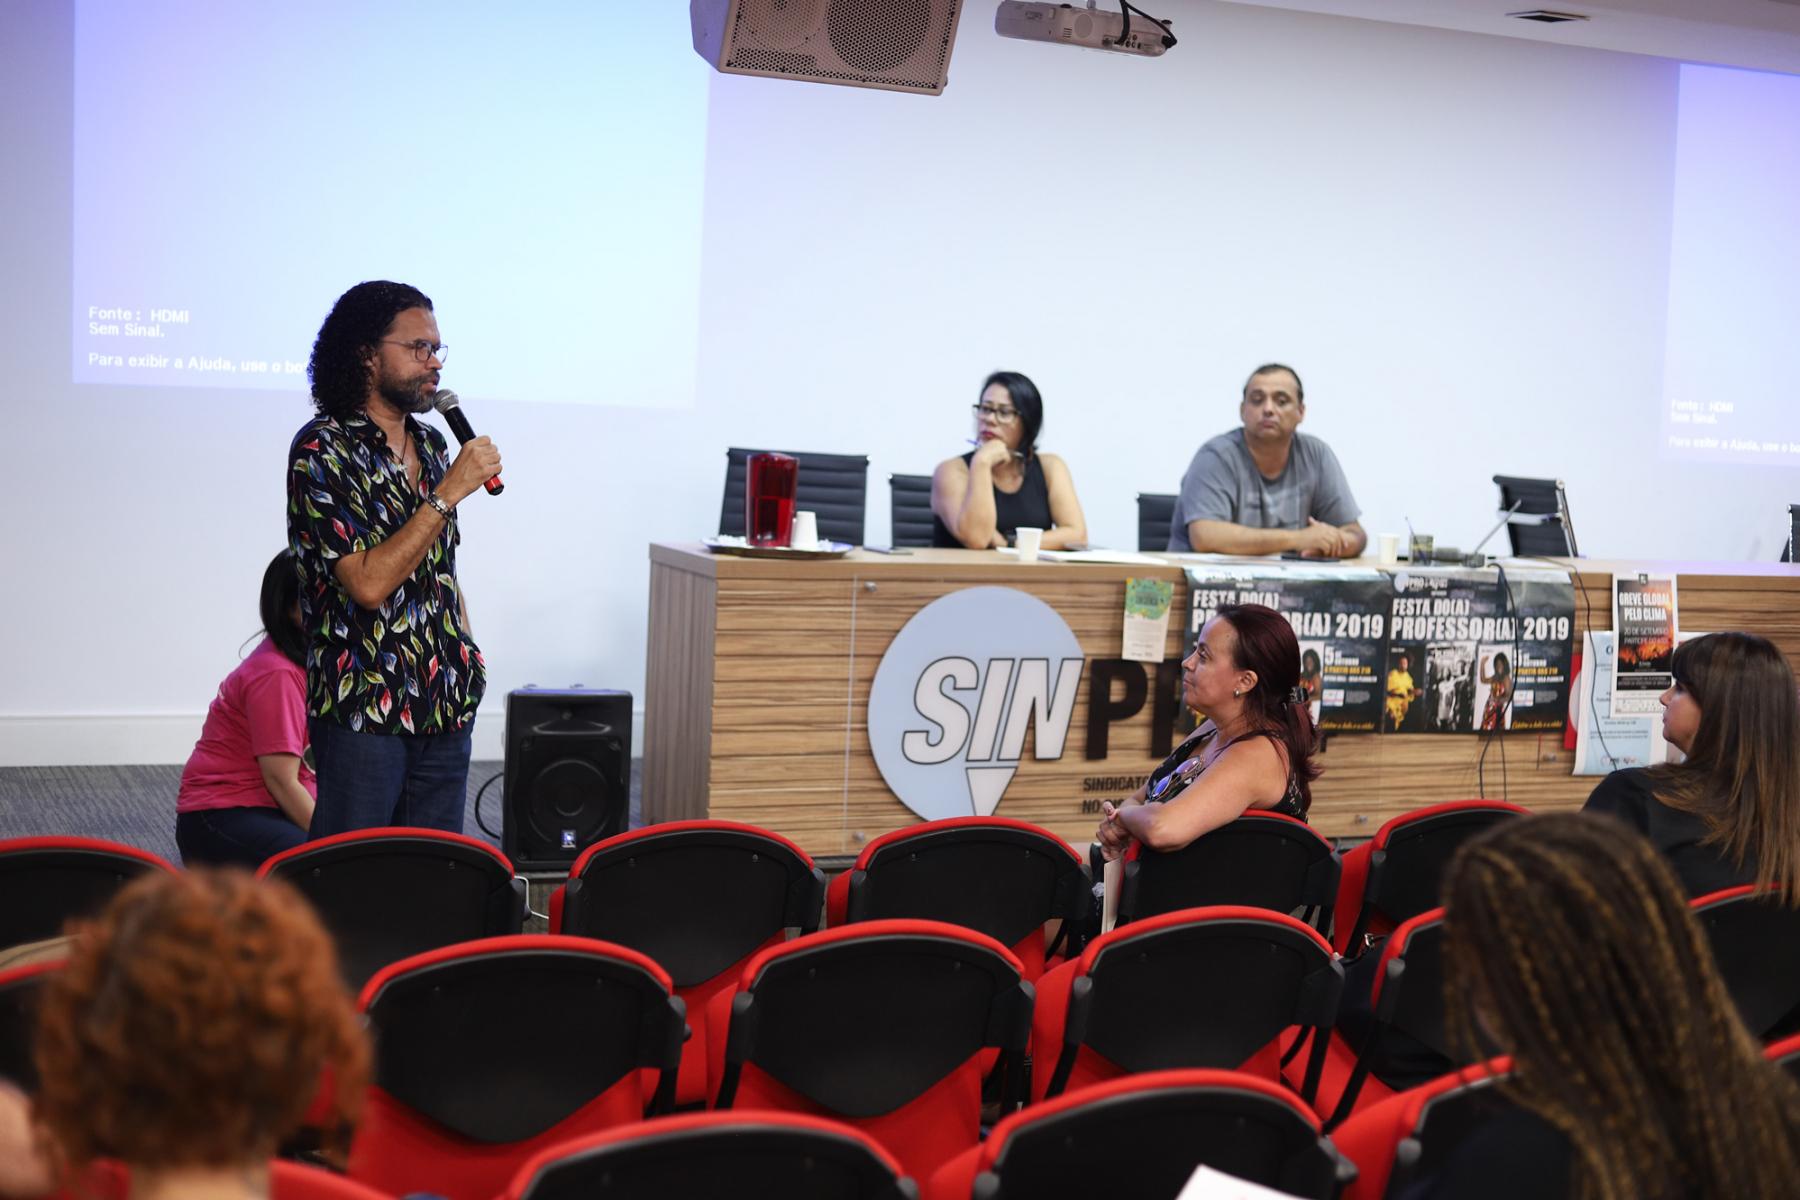 2019.09.19-Plenaria-sobre-Gestao-Democratica_fotos-ECOM-21